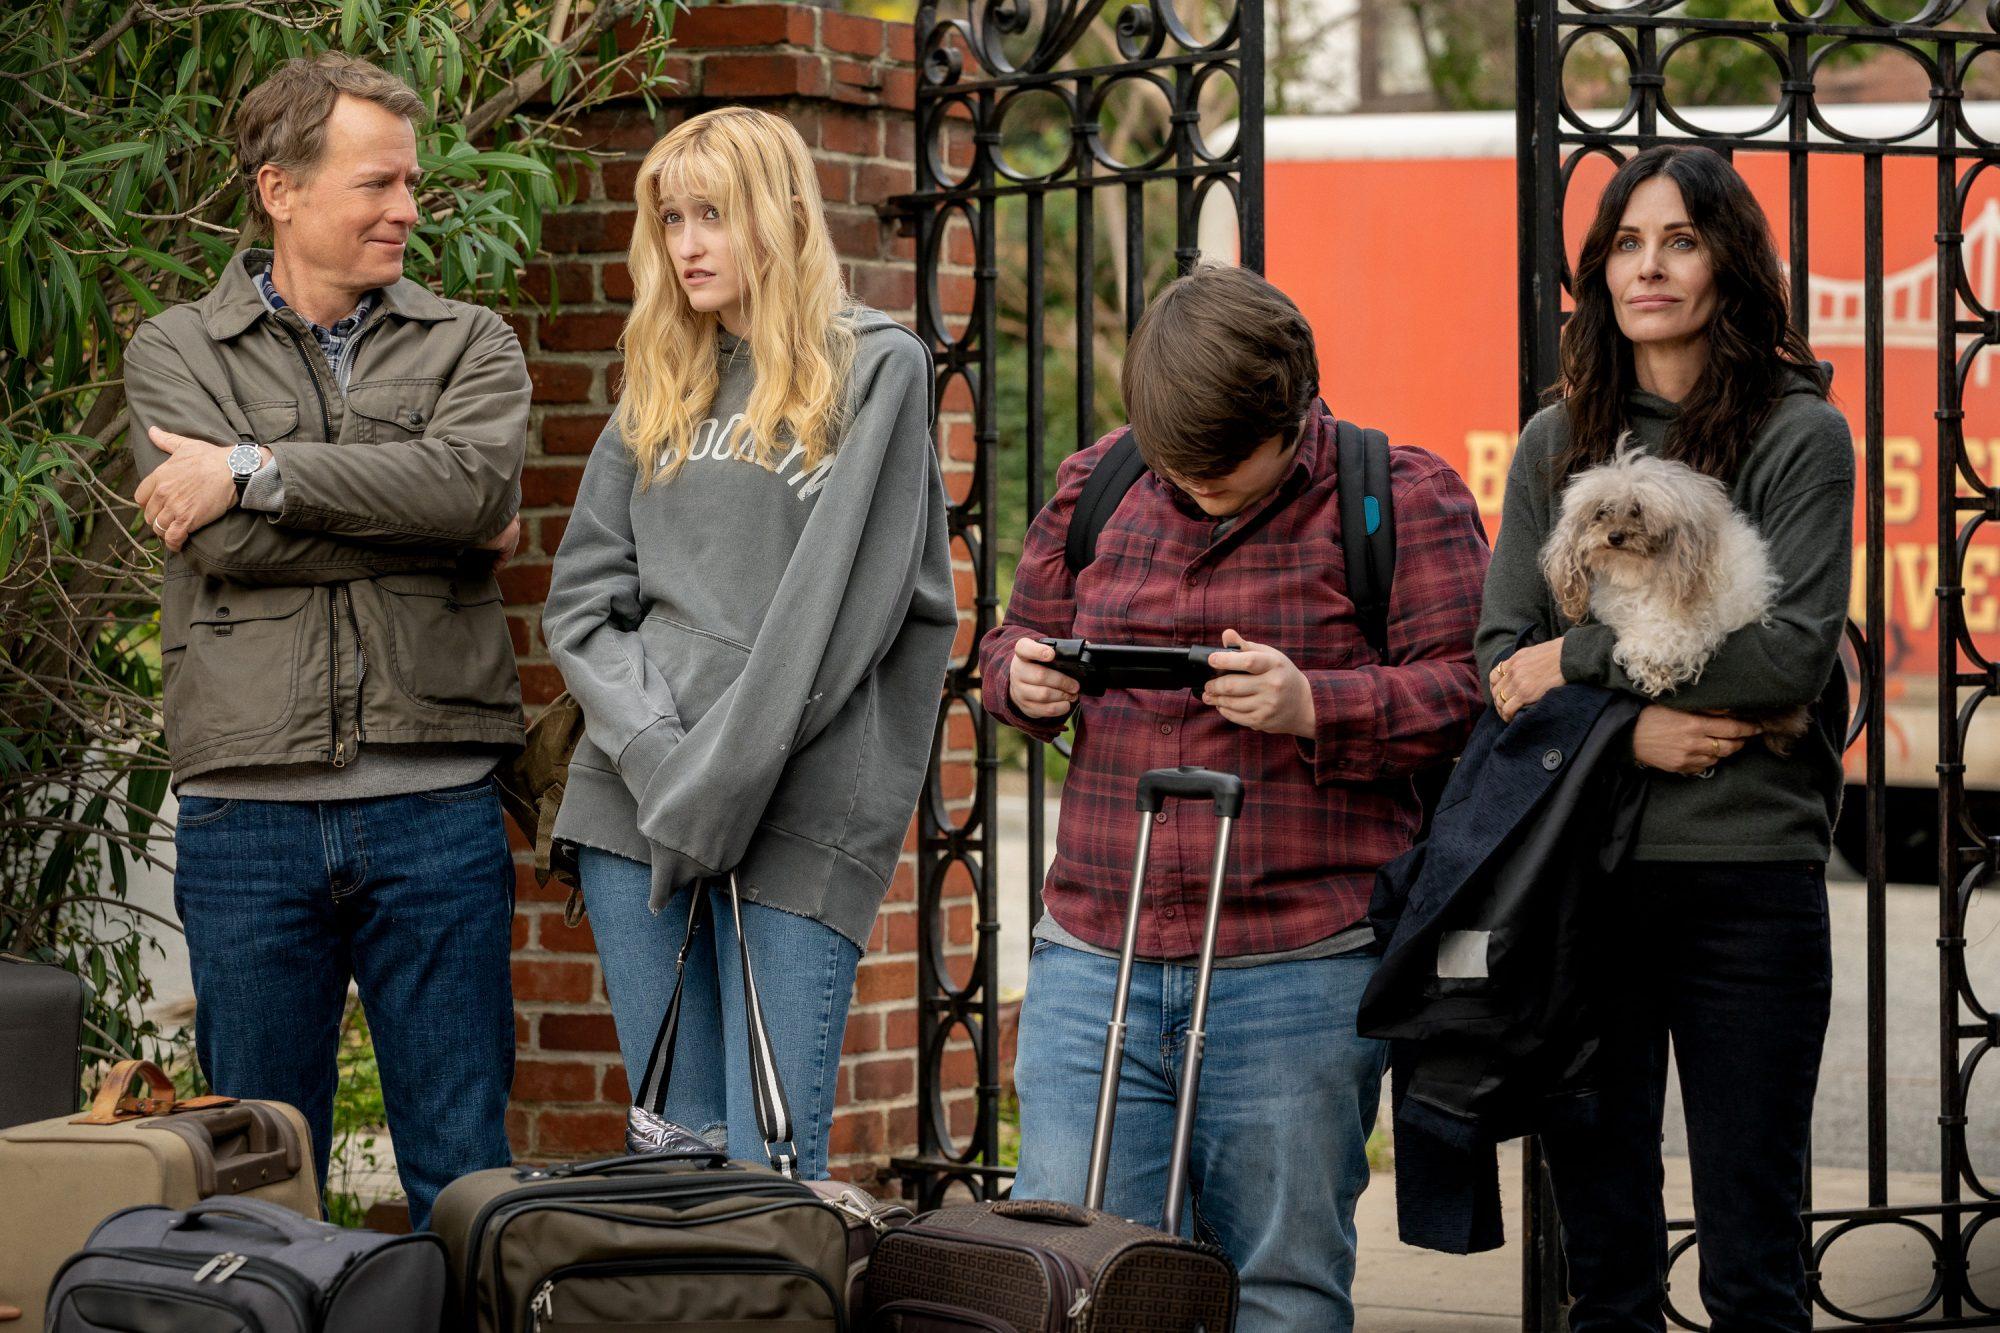 Courteney Cox, Greg Kinnear, Mira Sorvino Horror Comedy 'Shining Vale' Ordered to Series at Starz